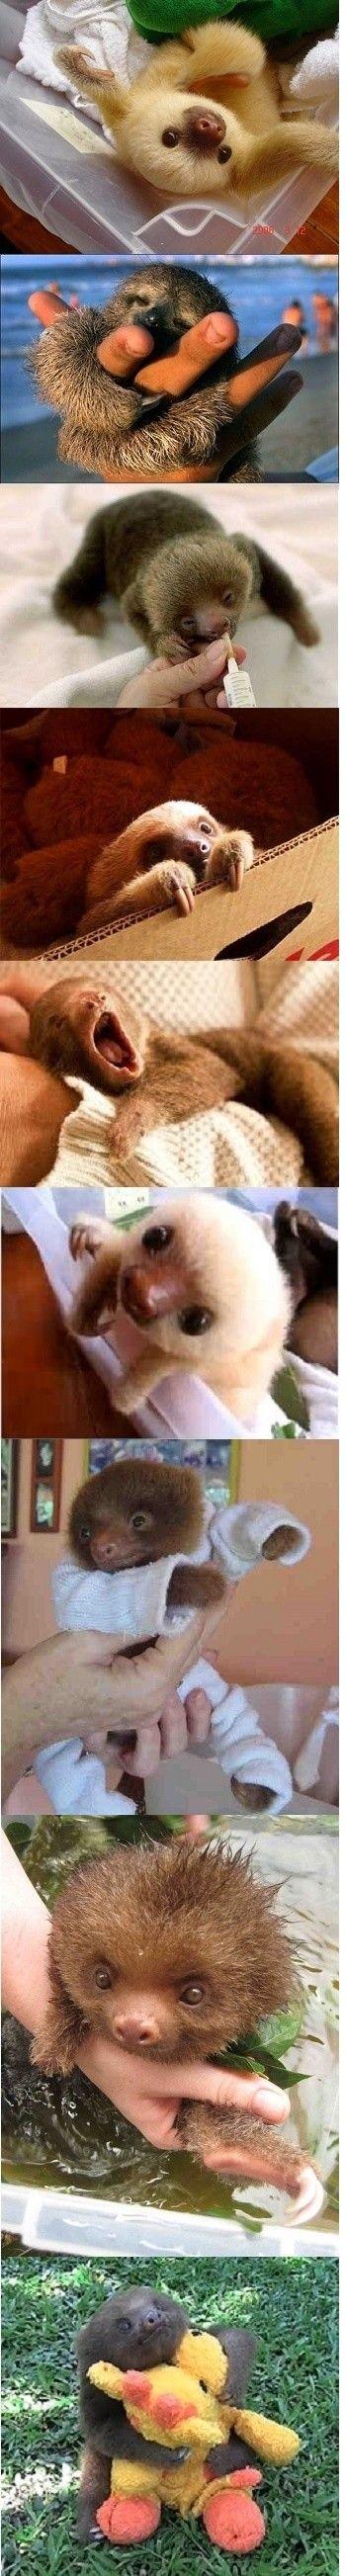 Baby sloths!